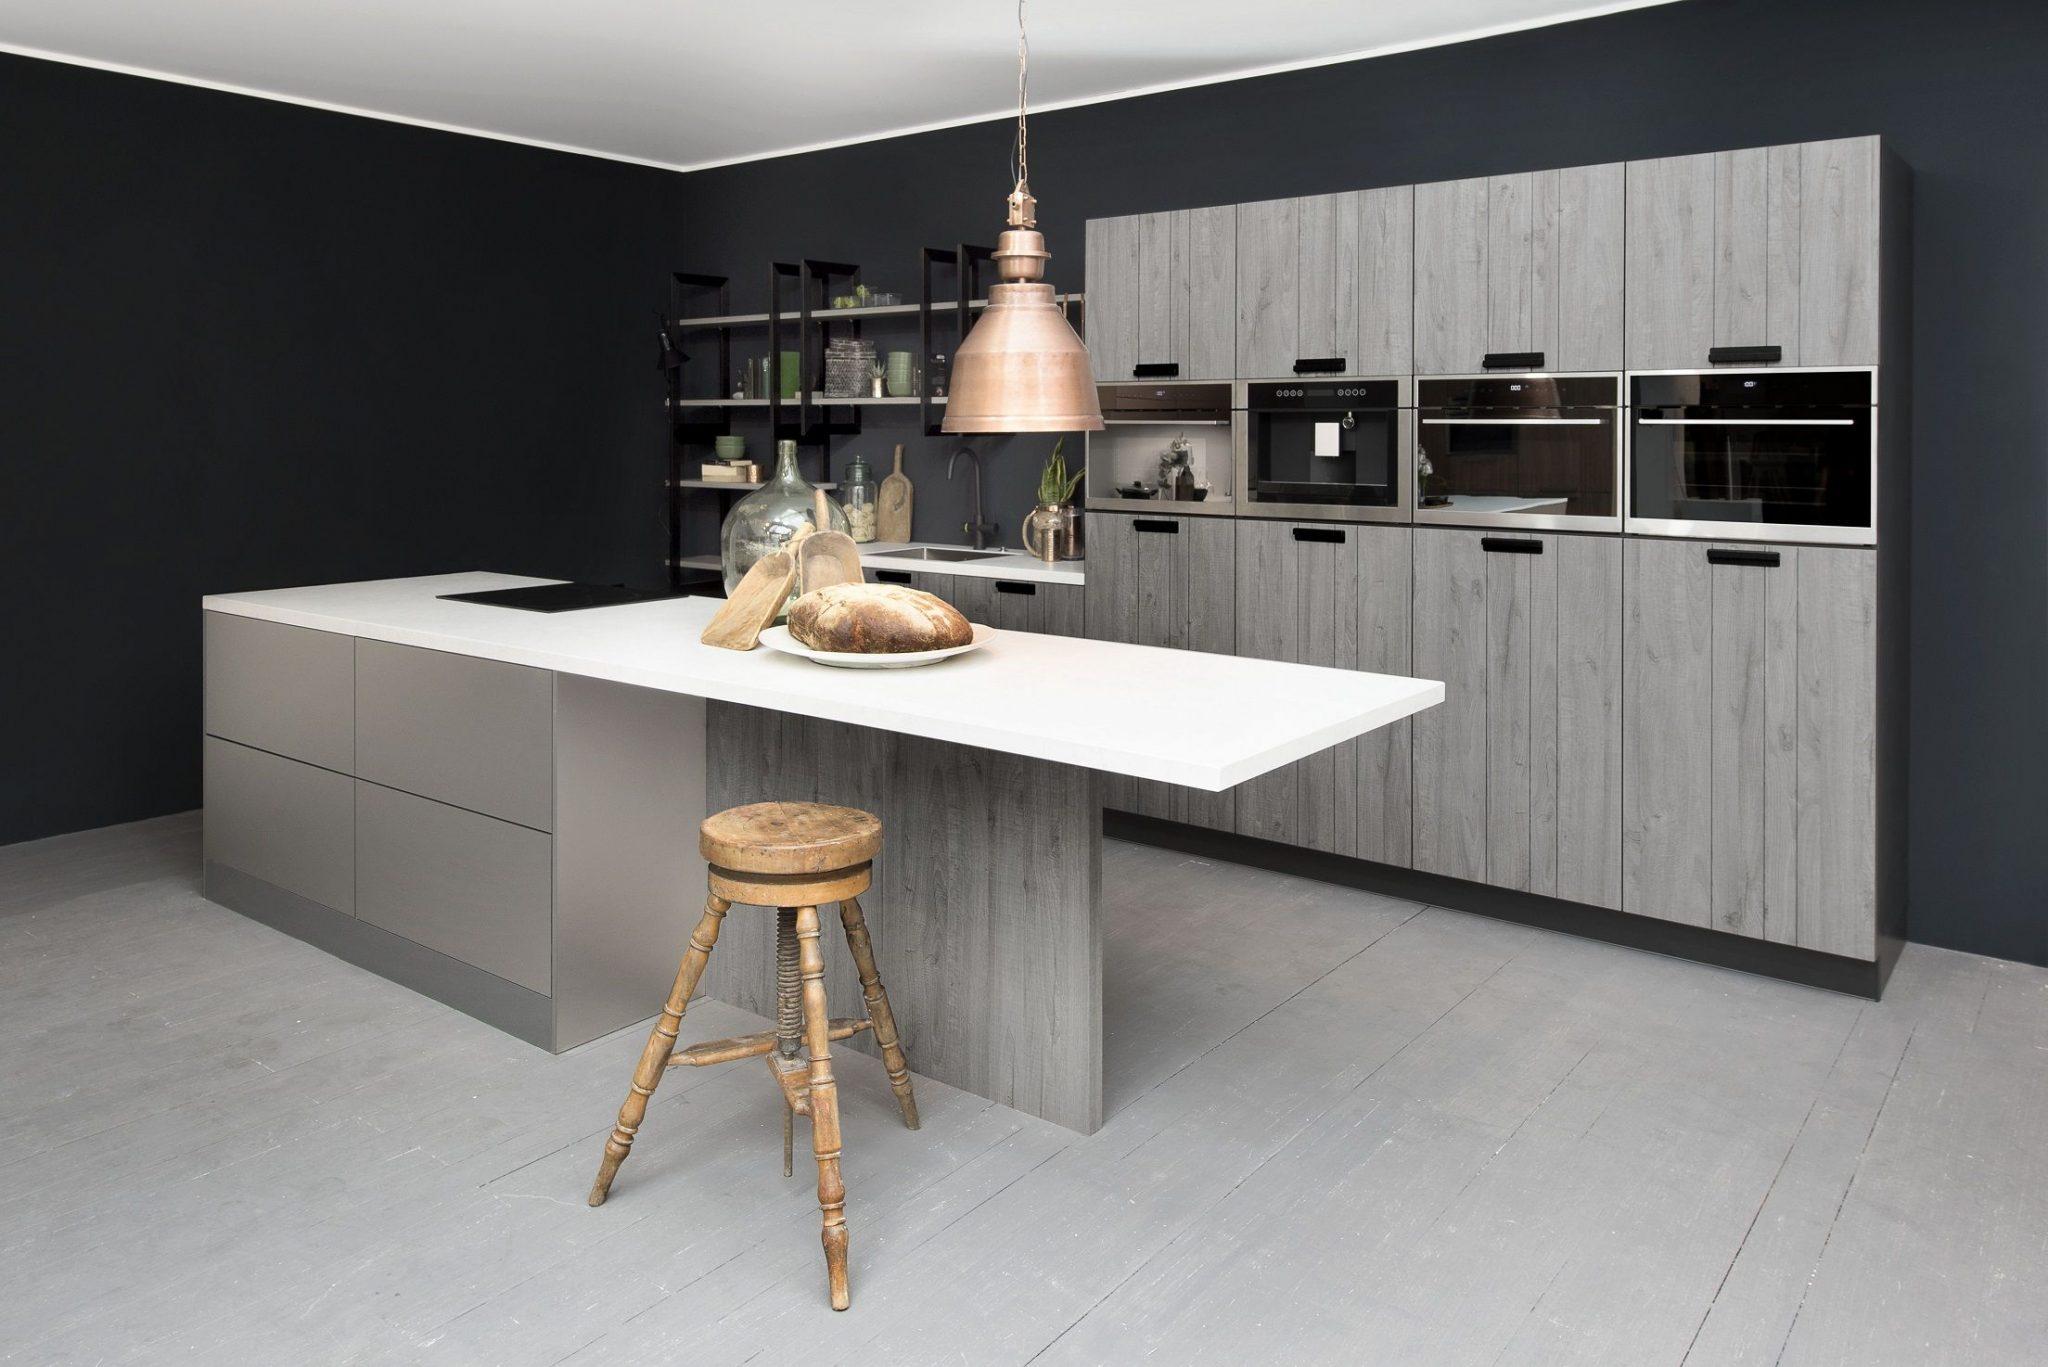 Schroder Keukens Nederland : Keukenzaak bolsward friesland bkb keukens